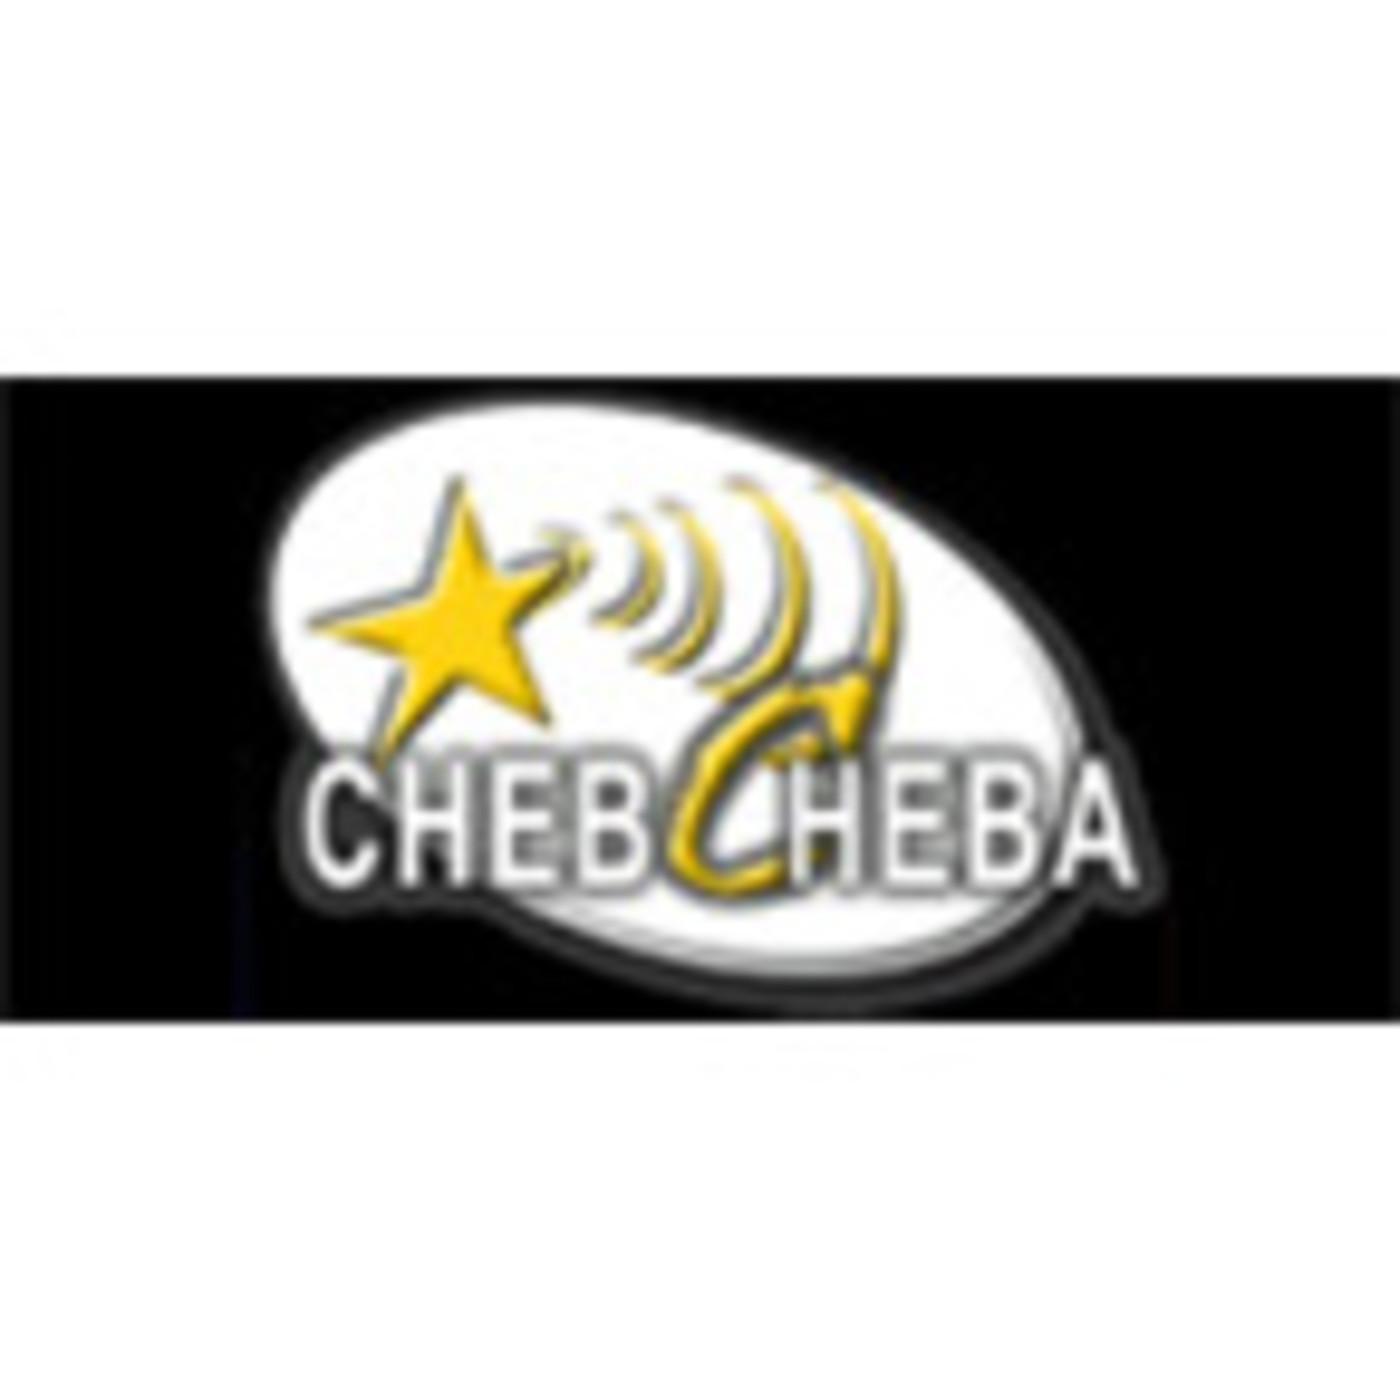 - Cheb Cheba